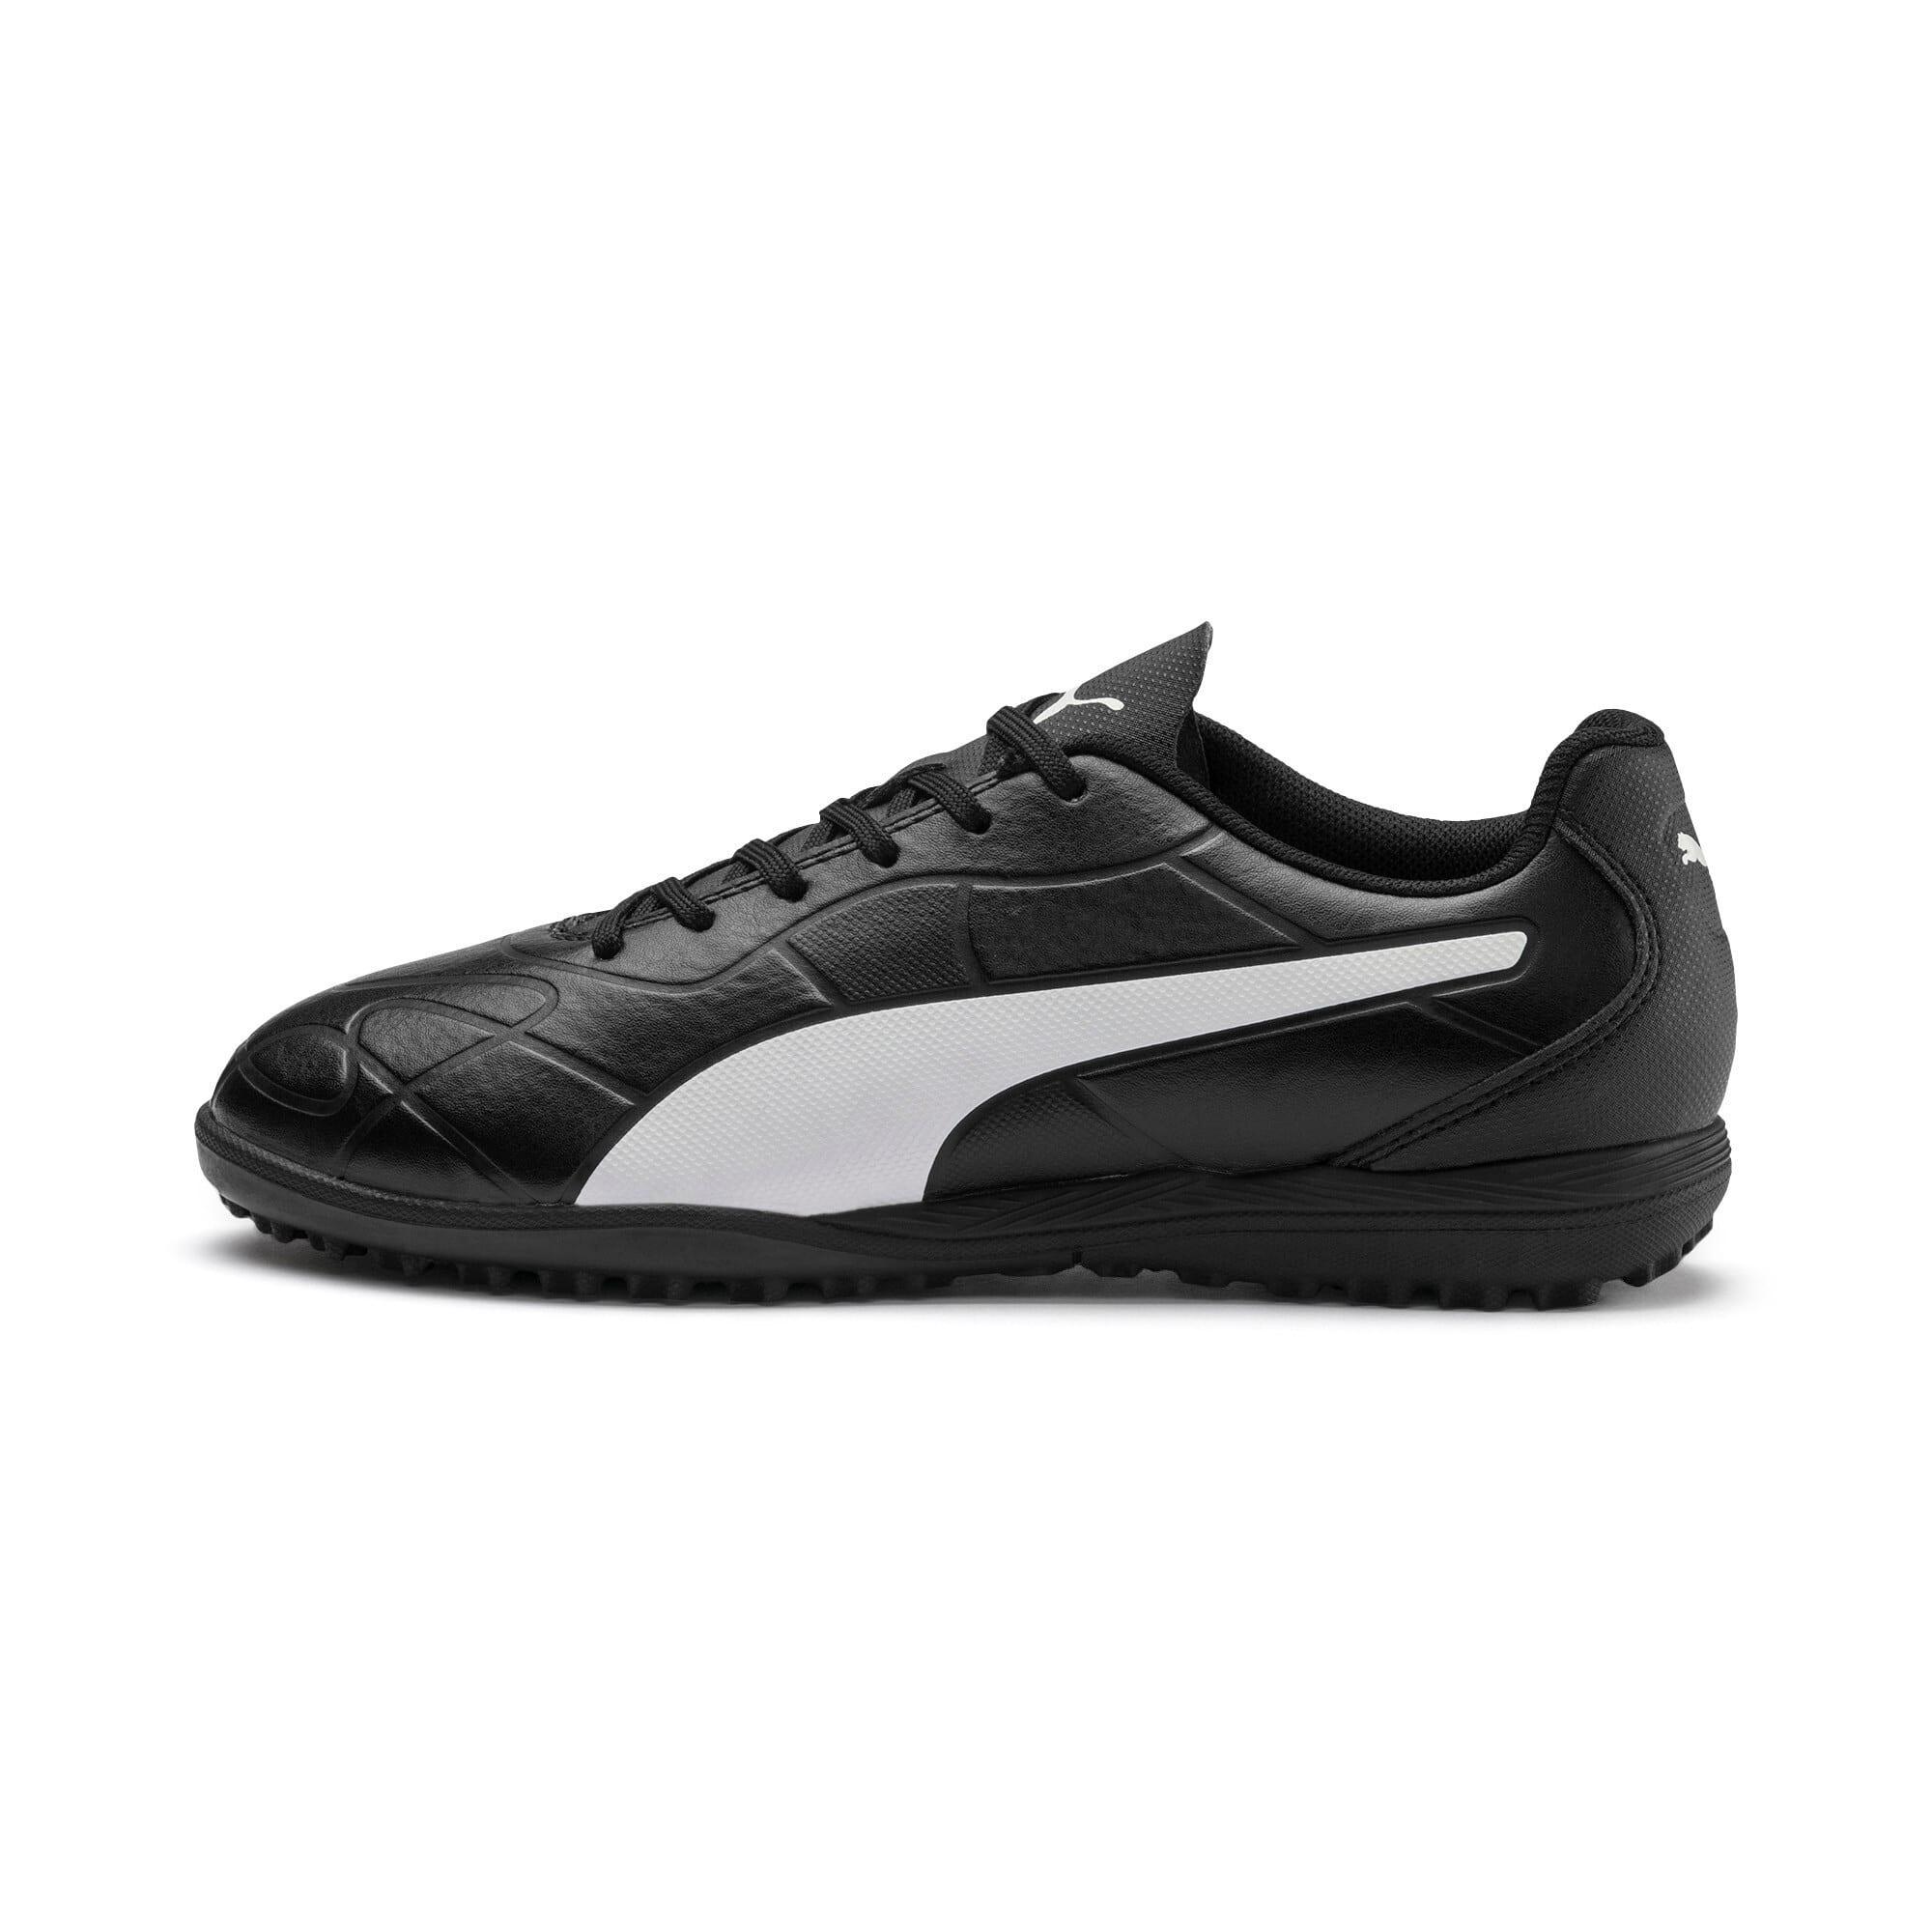 Thumbnail 1 of Monarch TT Youth Football Boots, Puma Black-Puma White, medium-IND